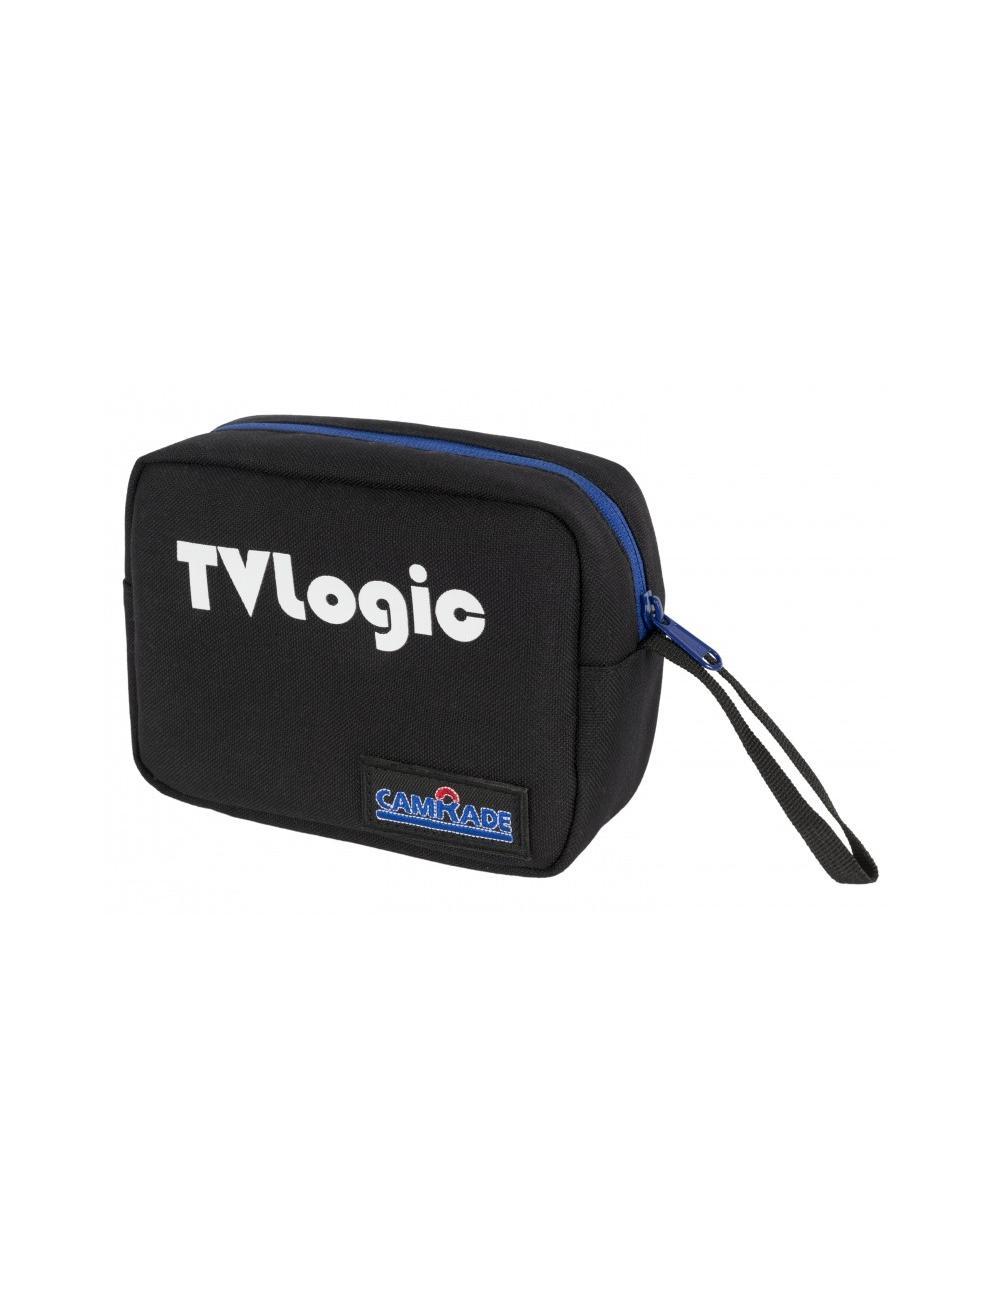 TVLogic 5